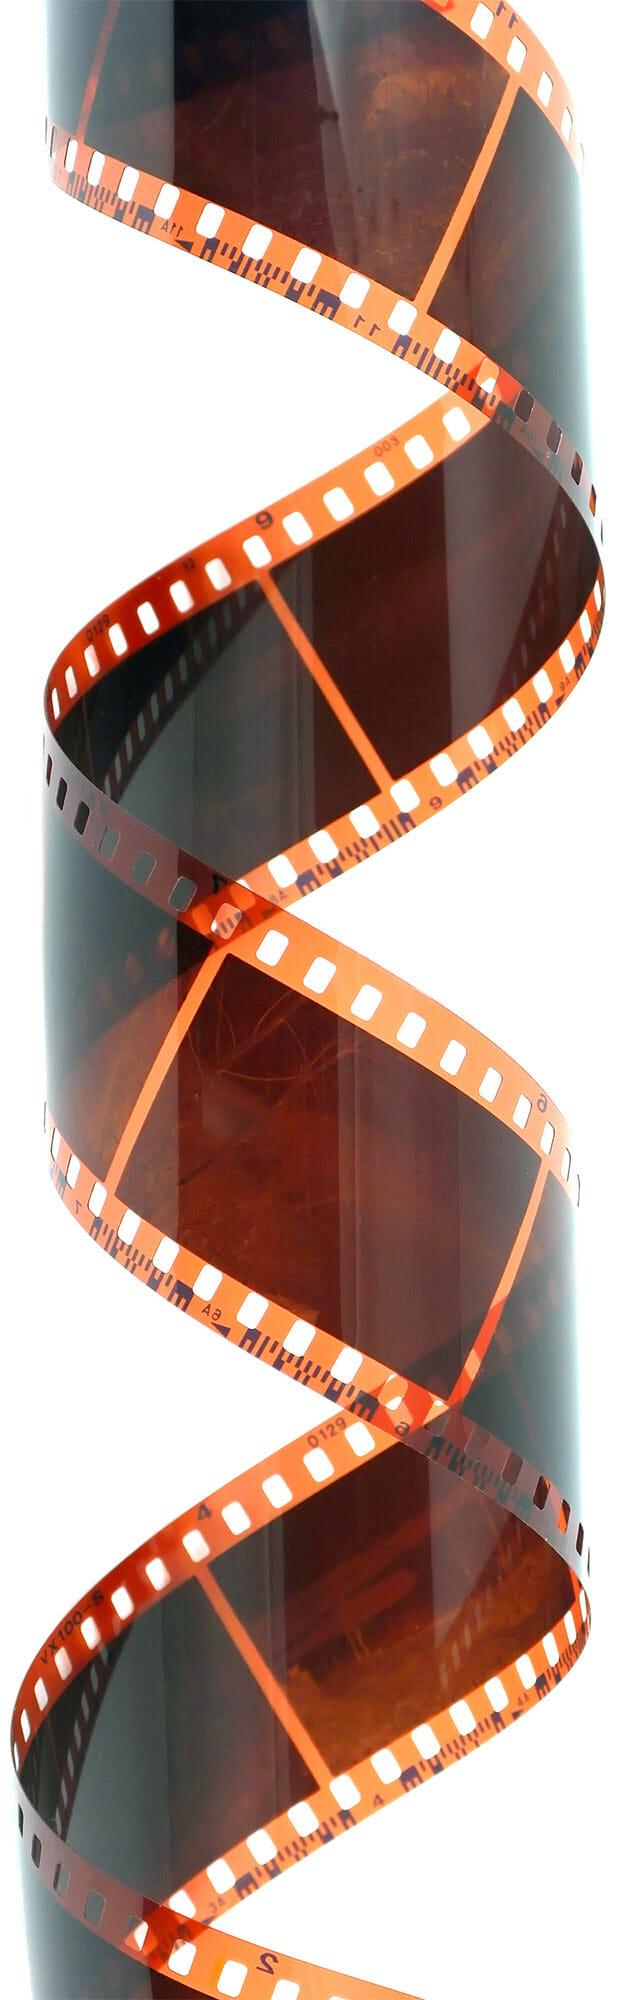 film reel twisted hollywood movie style tape